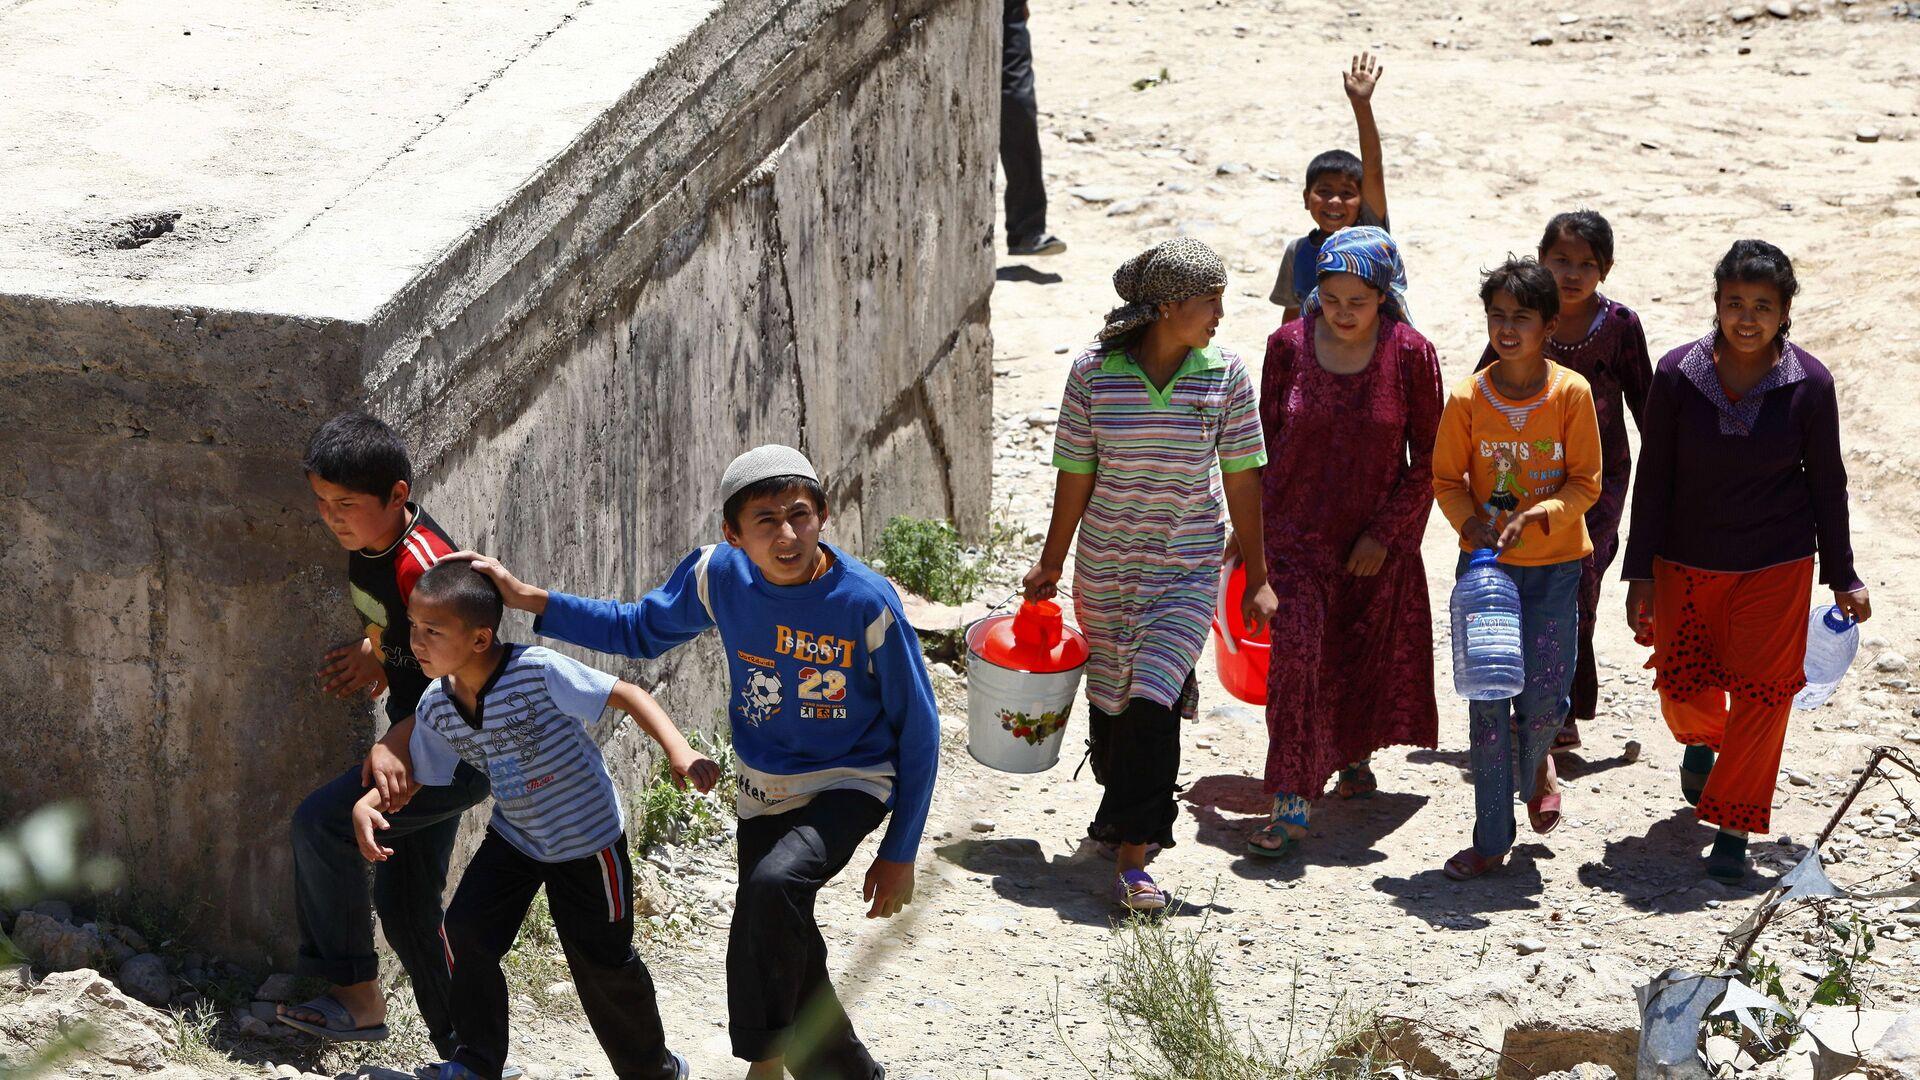 Узбекские беженцы - Sputnik Таджикистан, 1920, 07.07.2021